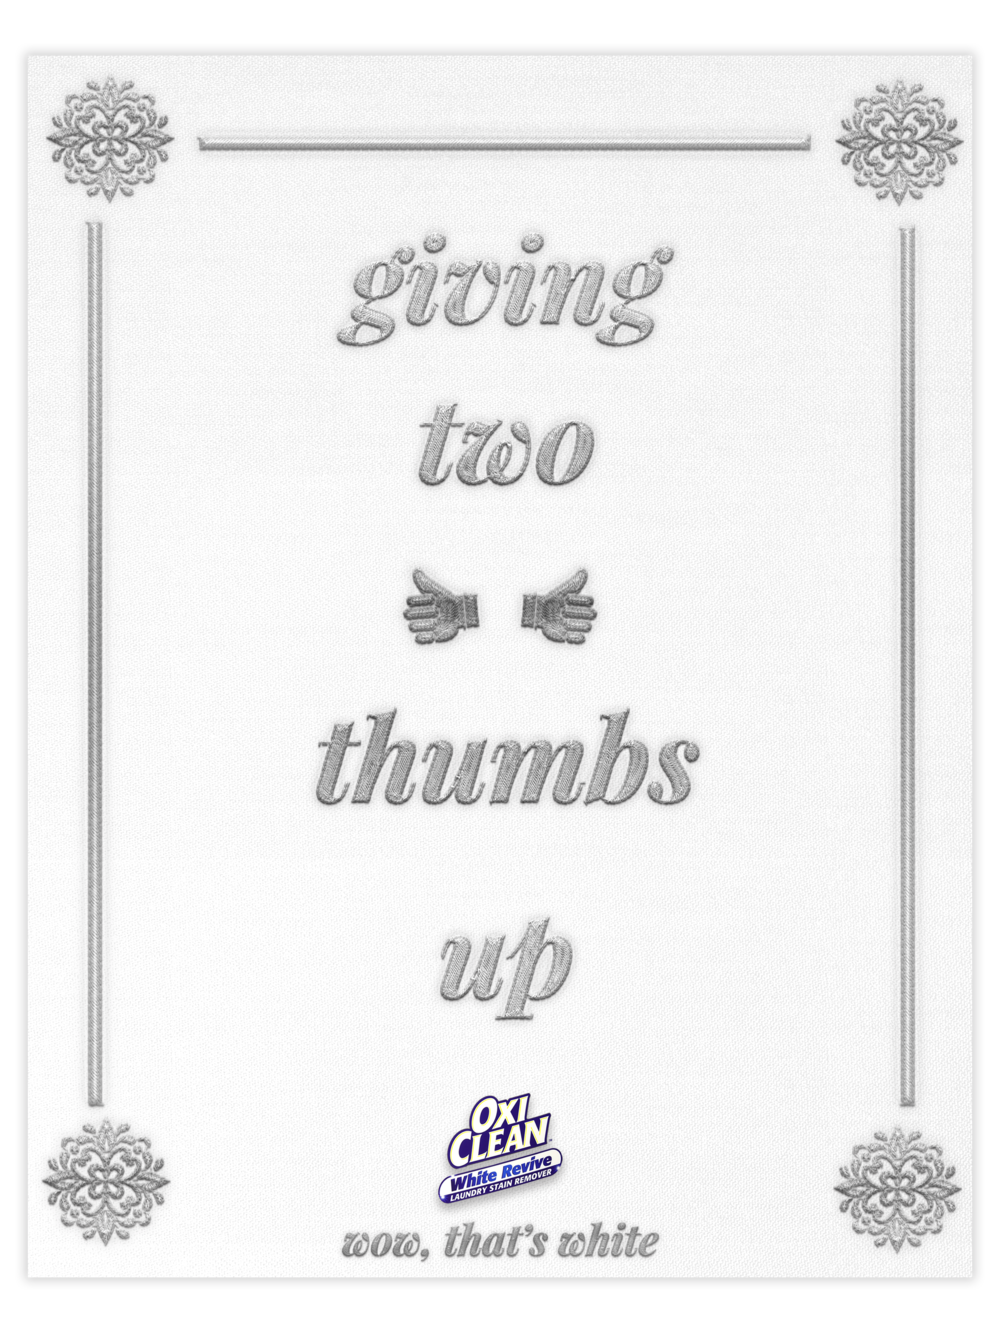 Print2_4.17_PING.png